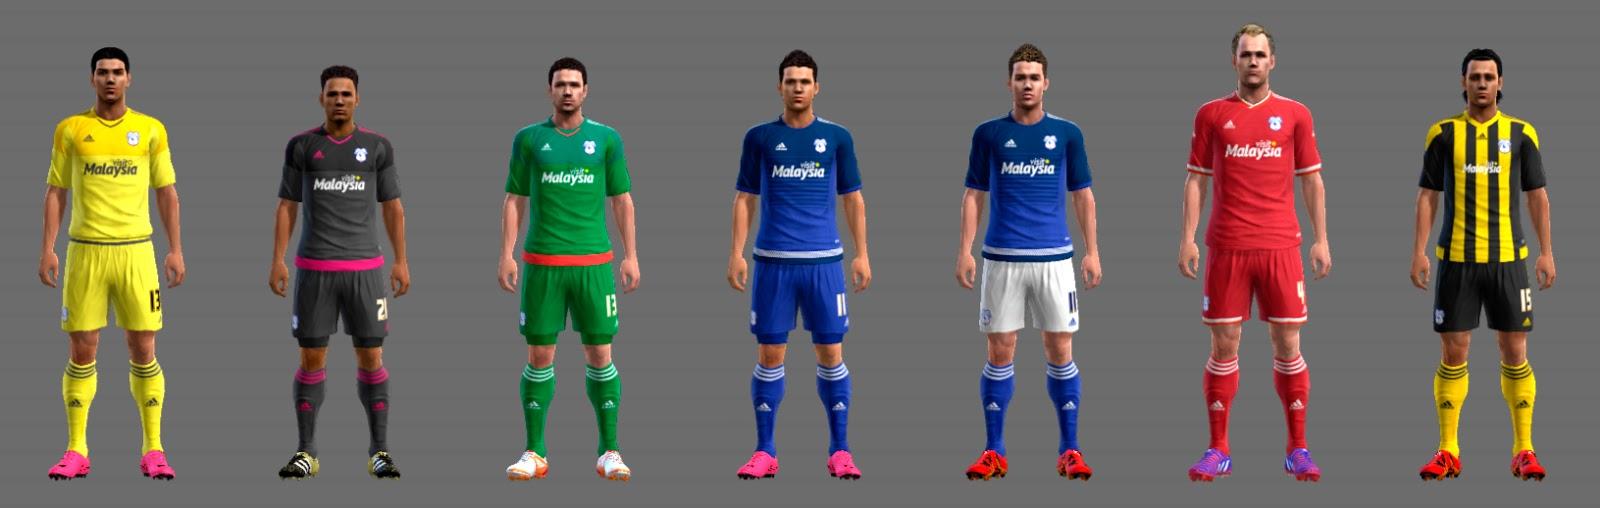 Cardiff City GDB 2015-16 UPDATE